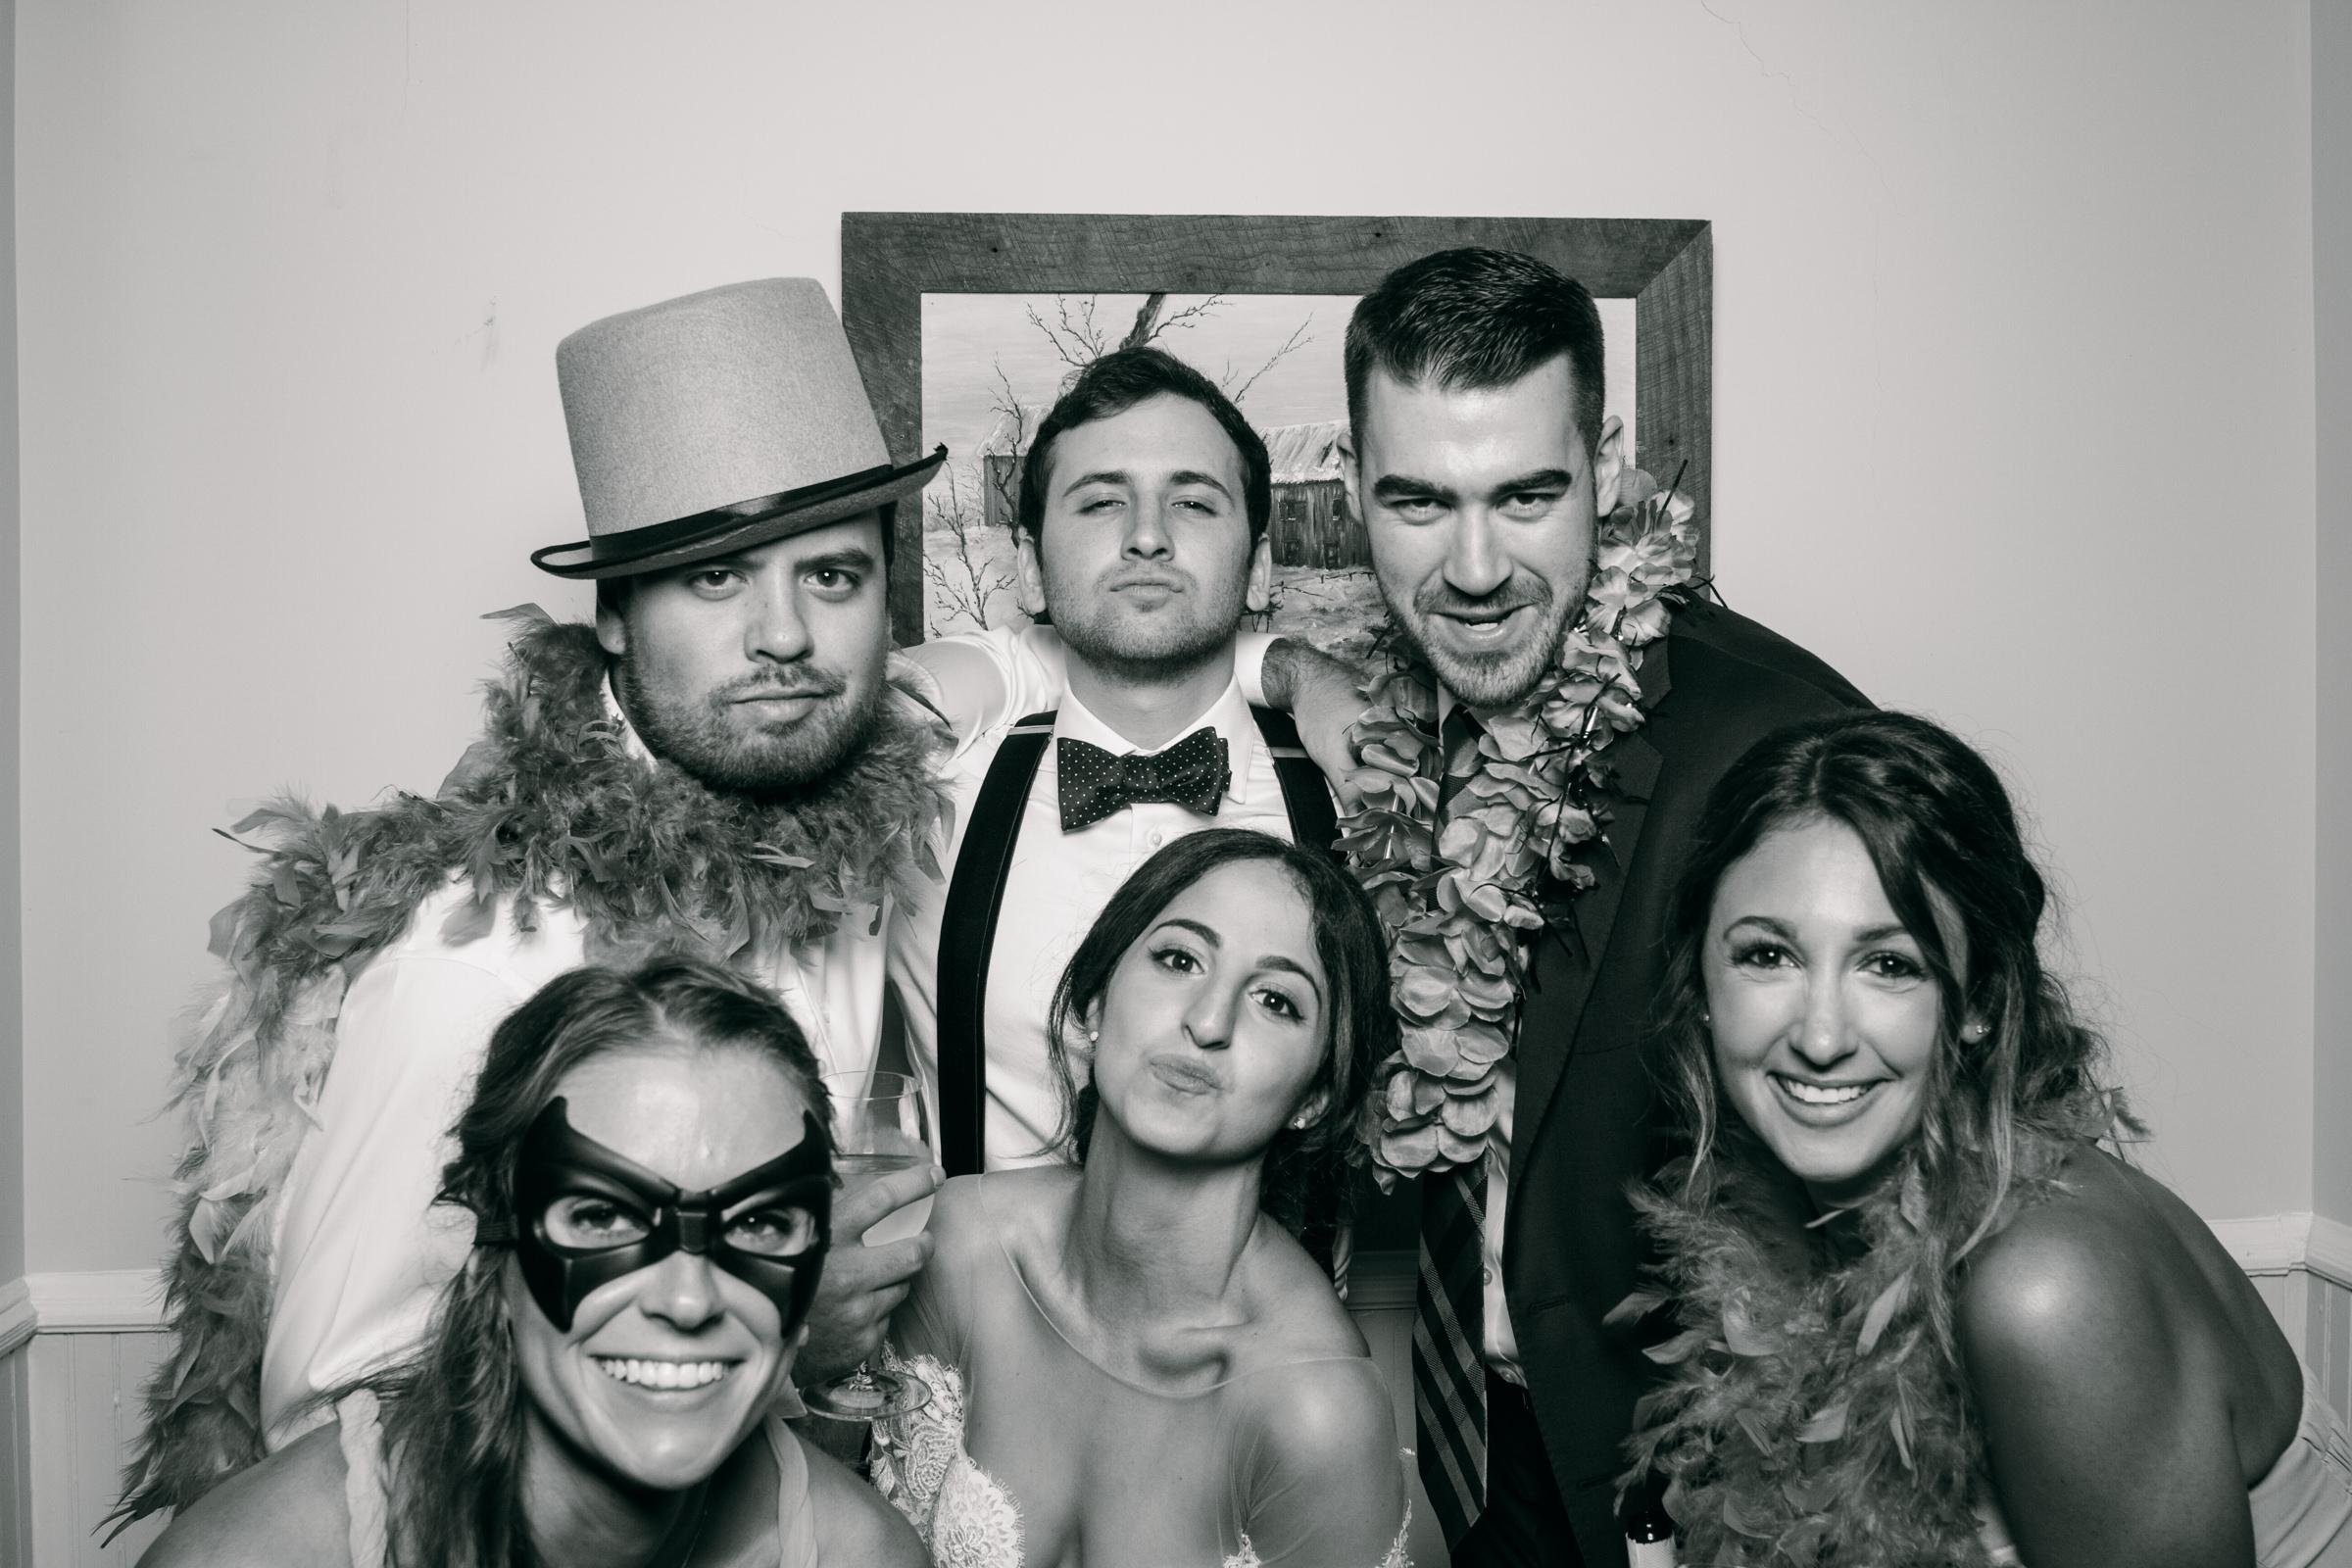 Nicole-Greg-Wedding-Photo-Booth-Lodge-Mountain-Springs-19.jpg